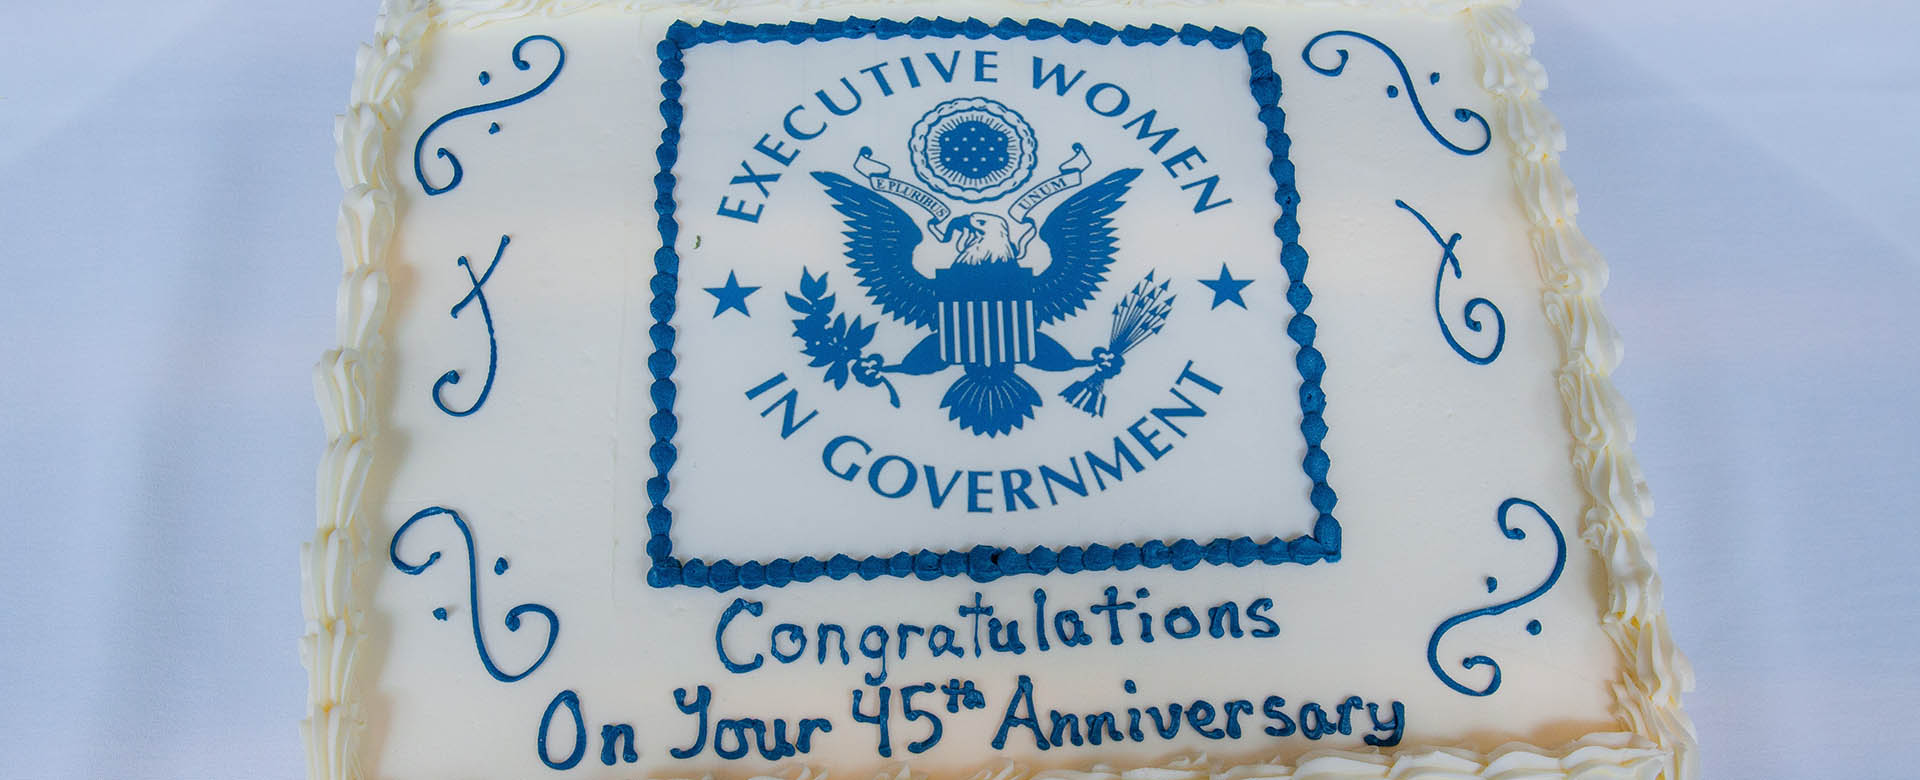 Executive Women in Government—45th Anniversary Celebration